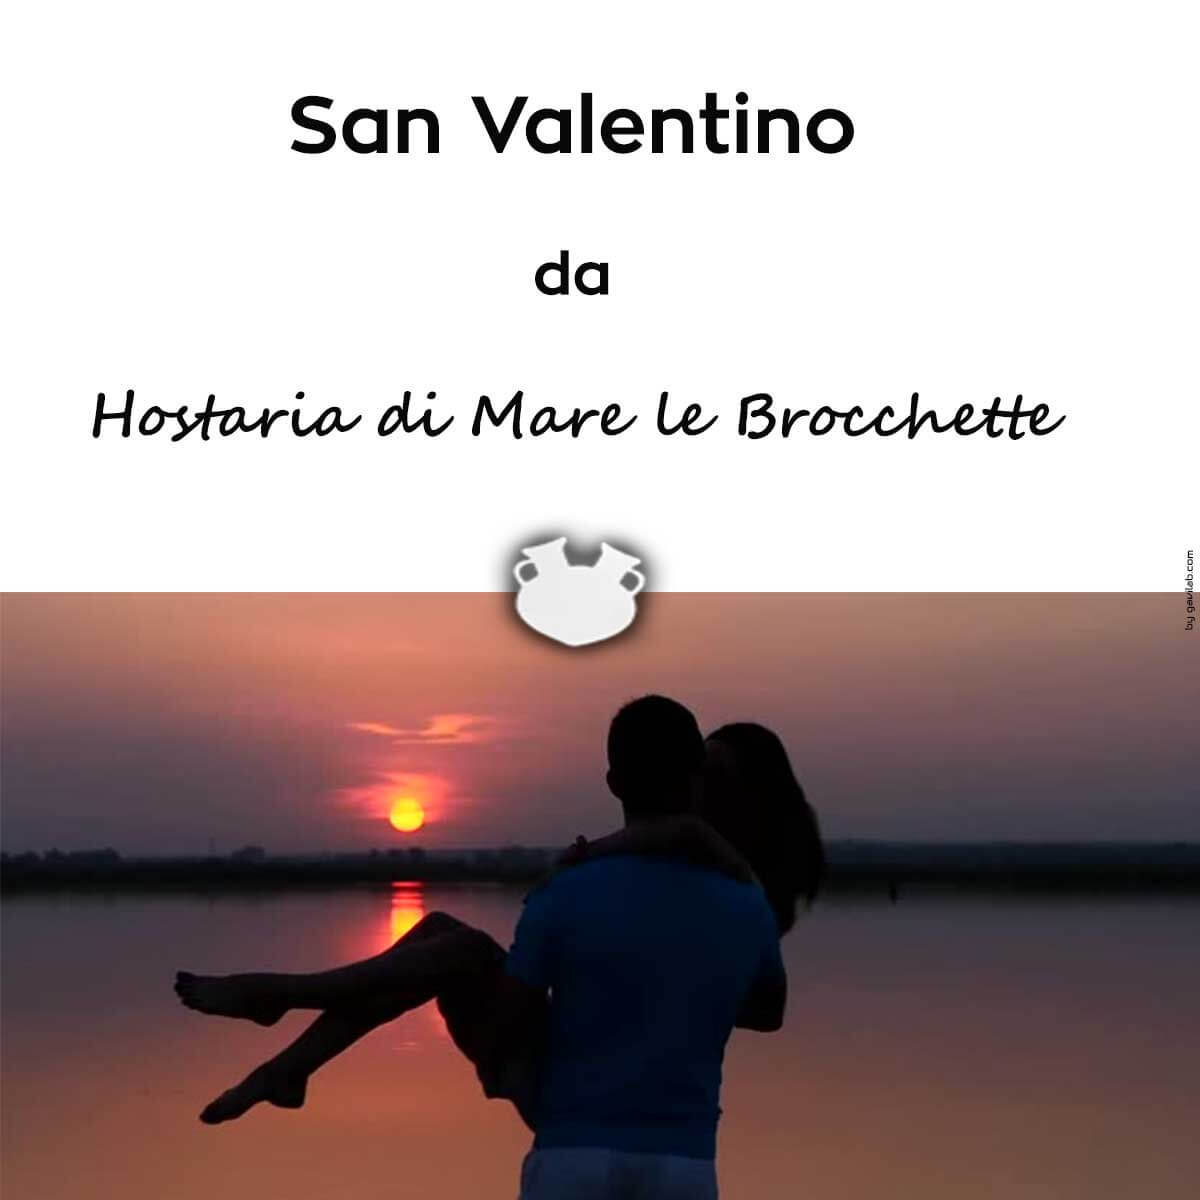 Cena San Valentino 2018